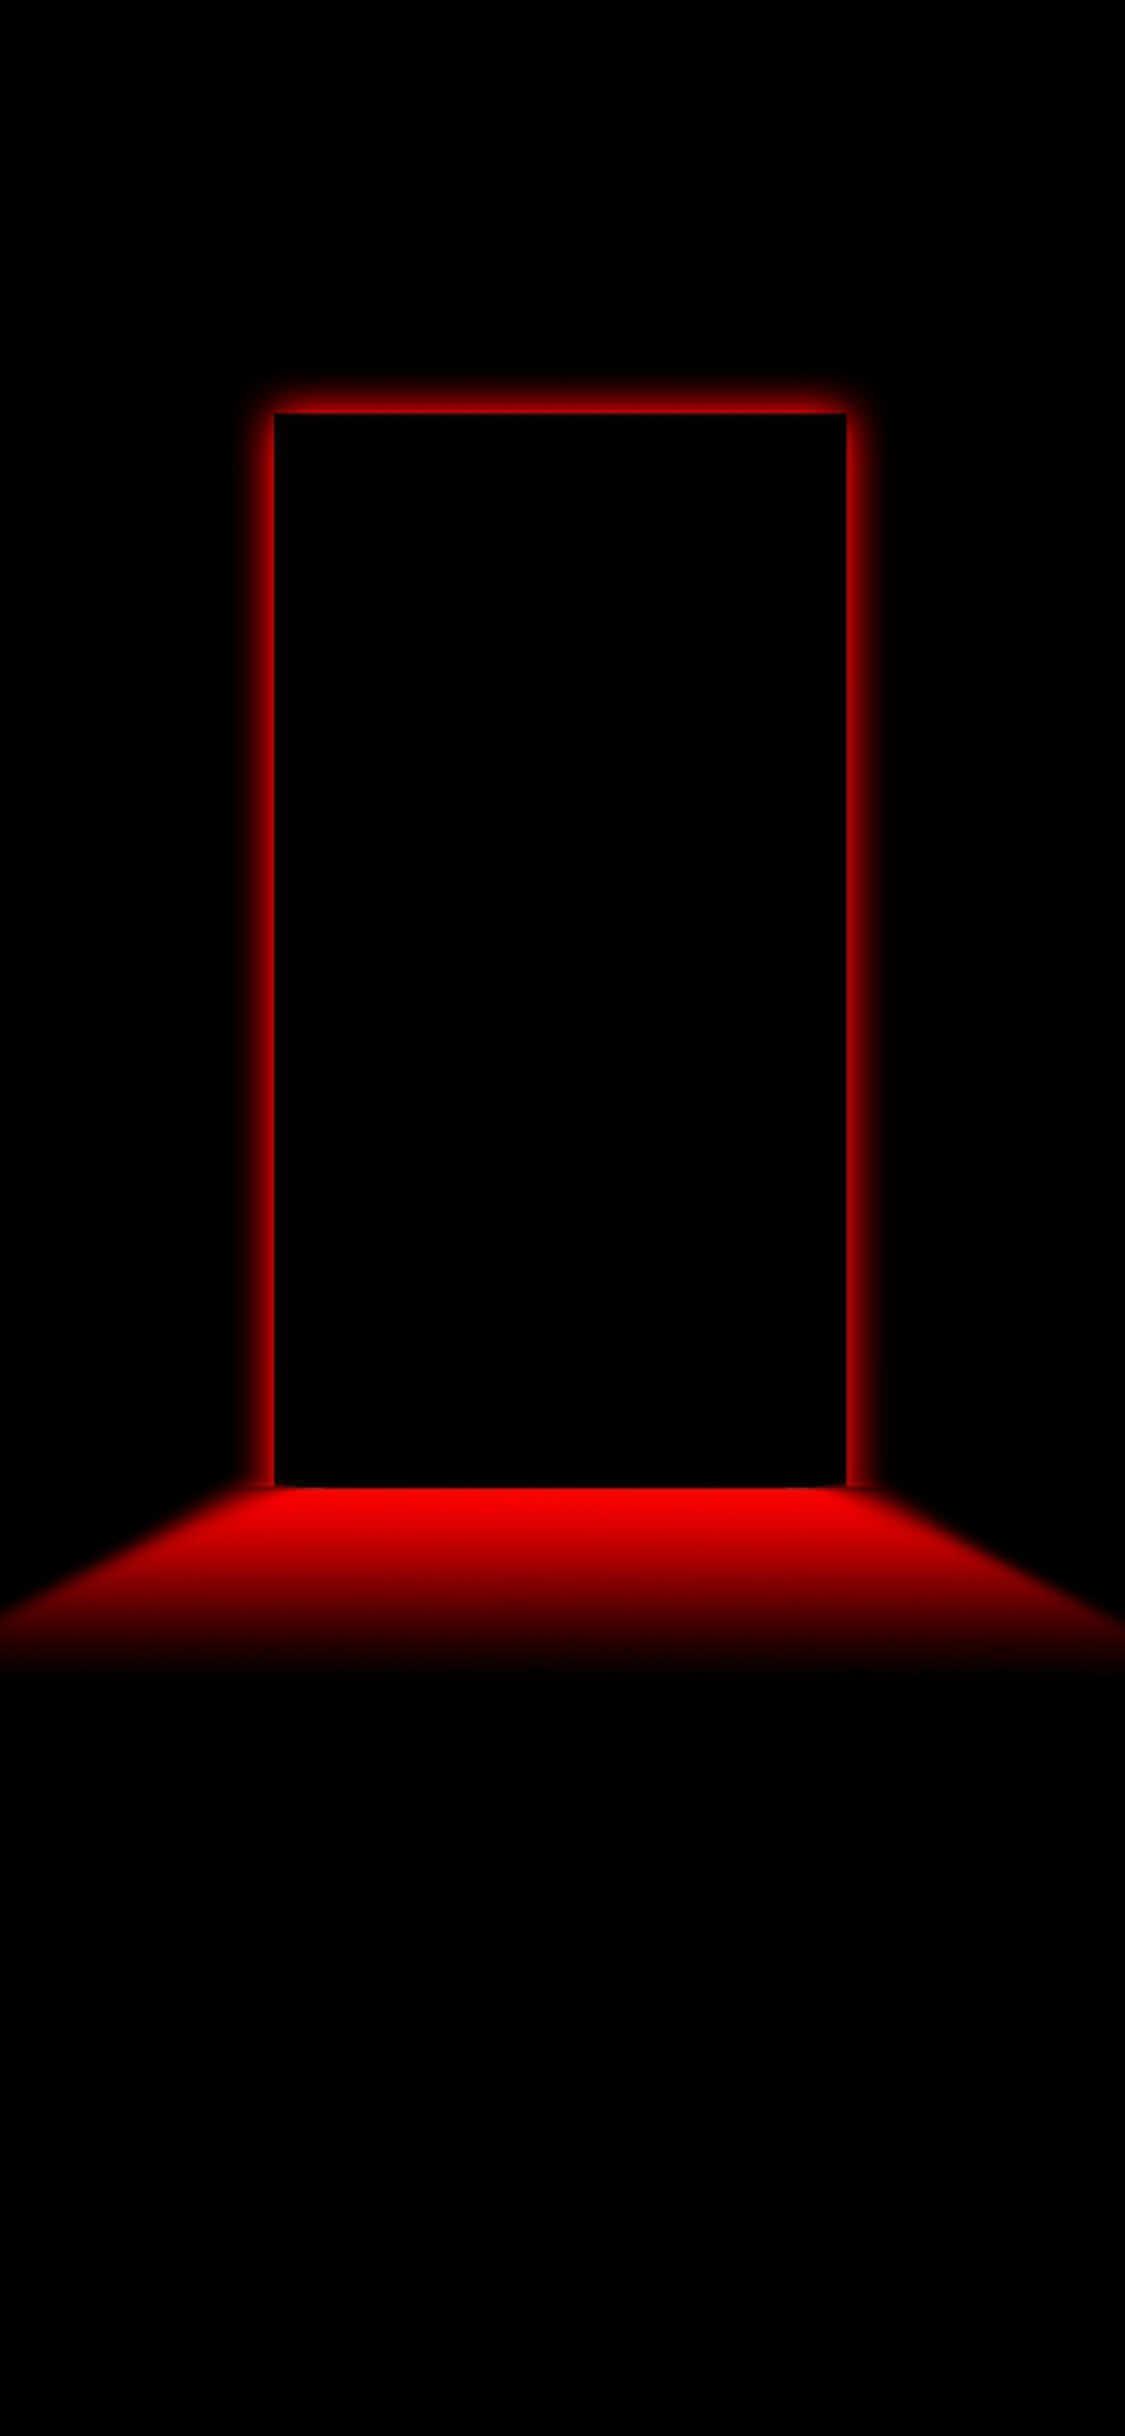 Black Dot Texture Iphone Wallpaper High Resolution Black Wallpaper Iphone 1024049 Hd Wallpaper Backgrounds Download